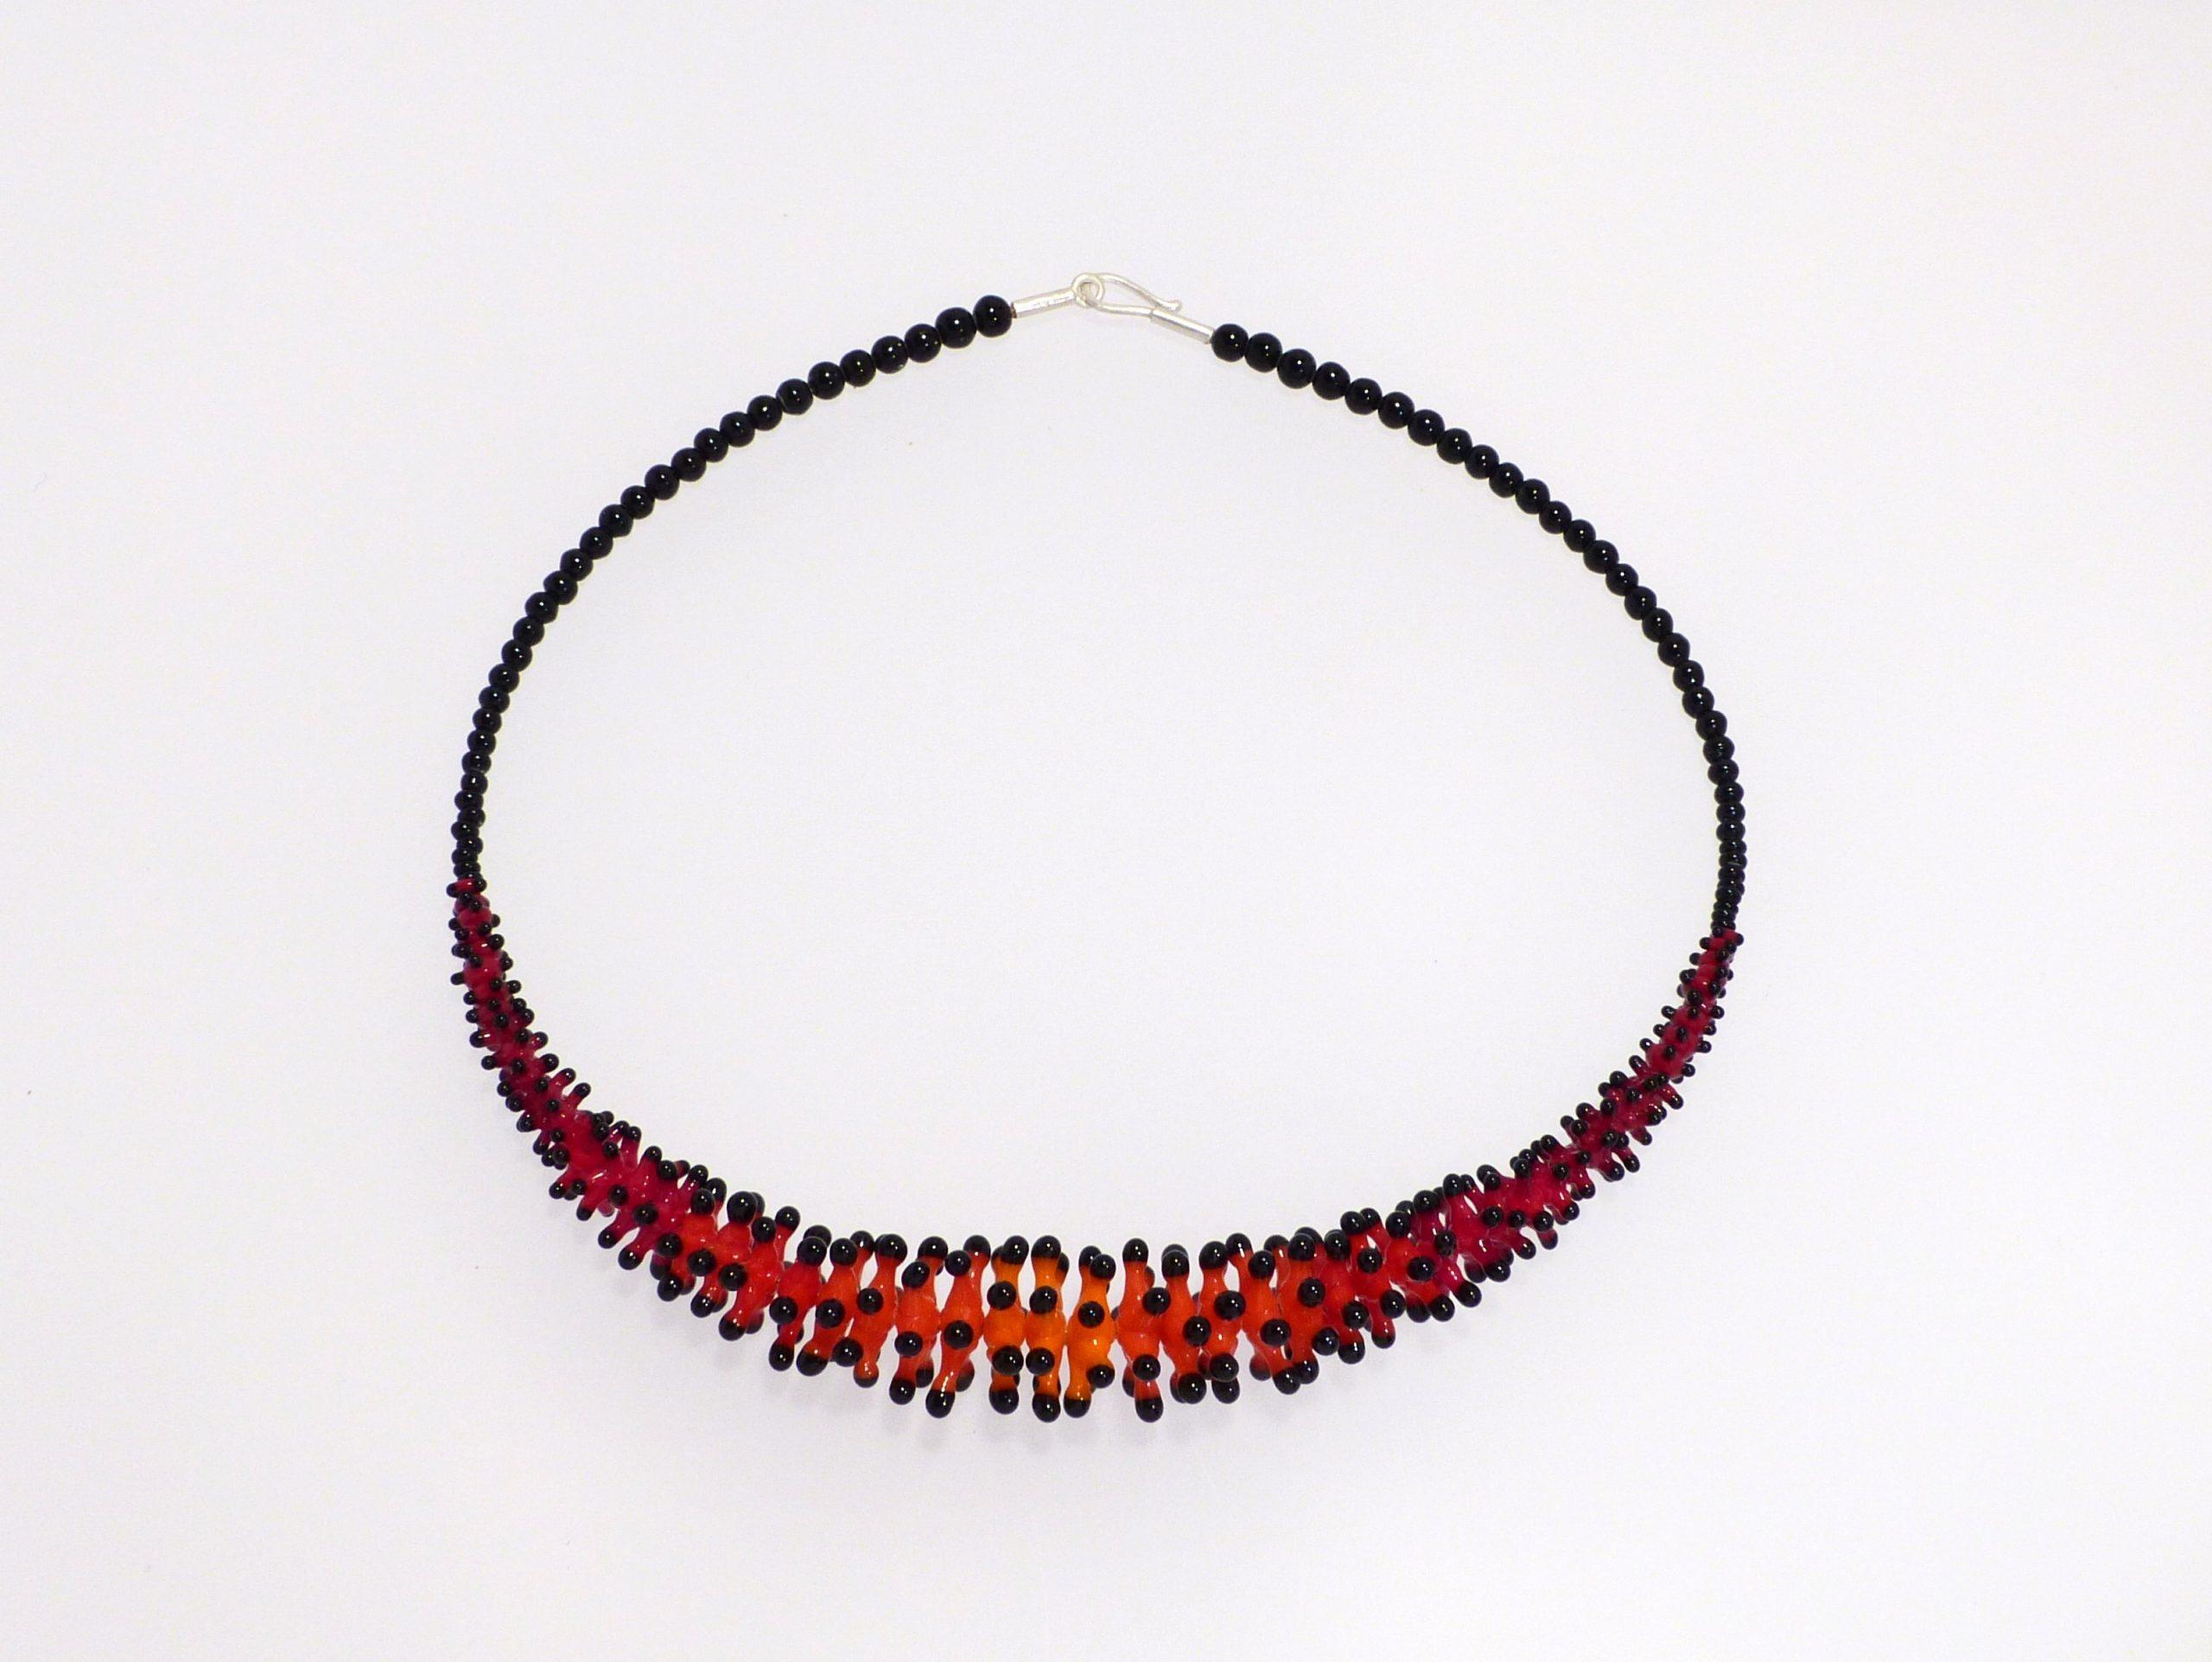 Pünktelwurm rot-orange Farbverlauf | Glas, Stahlseil, Silber | 1201001-20